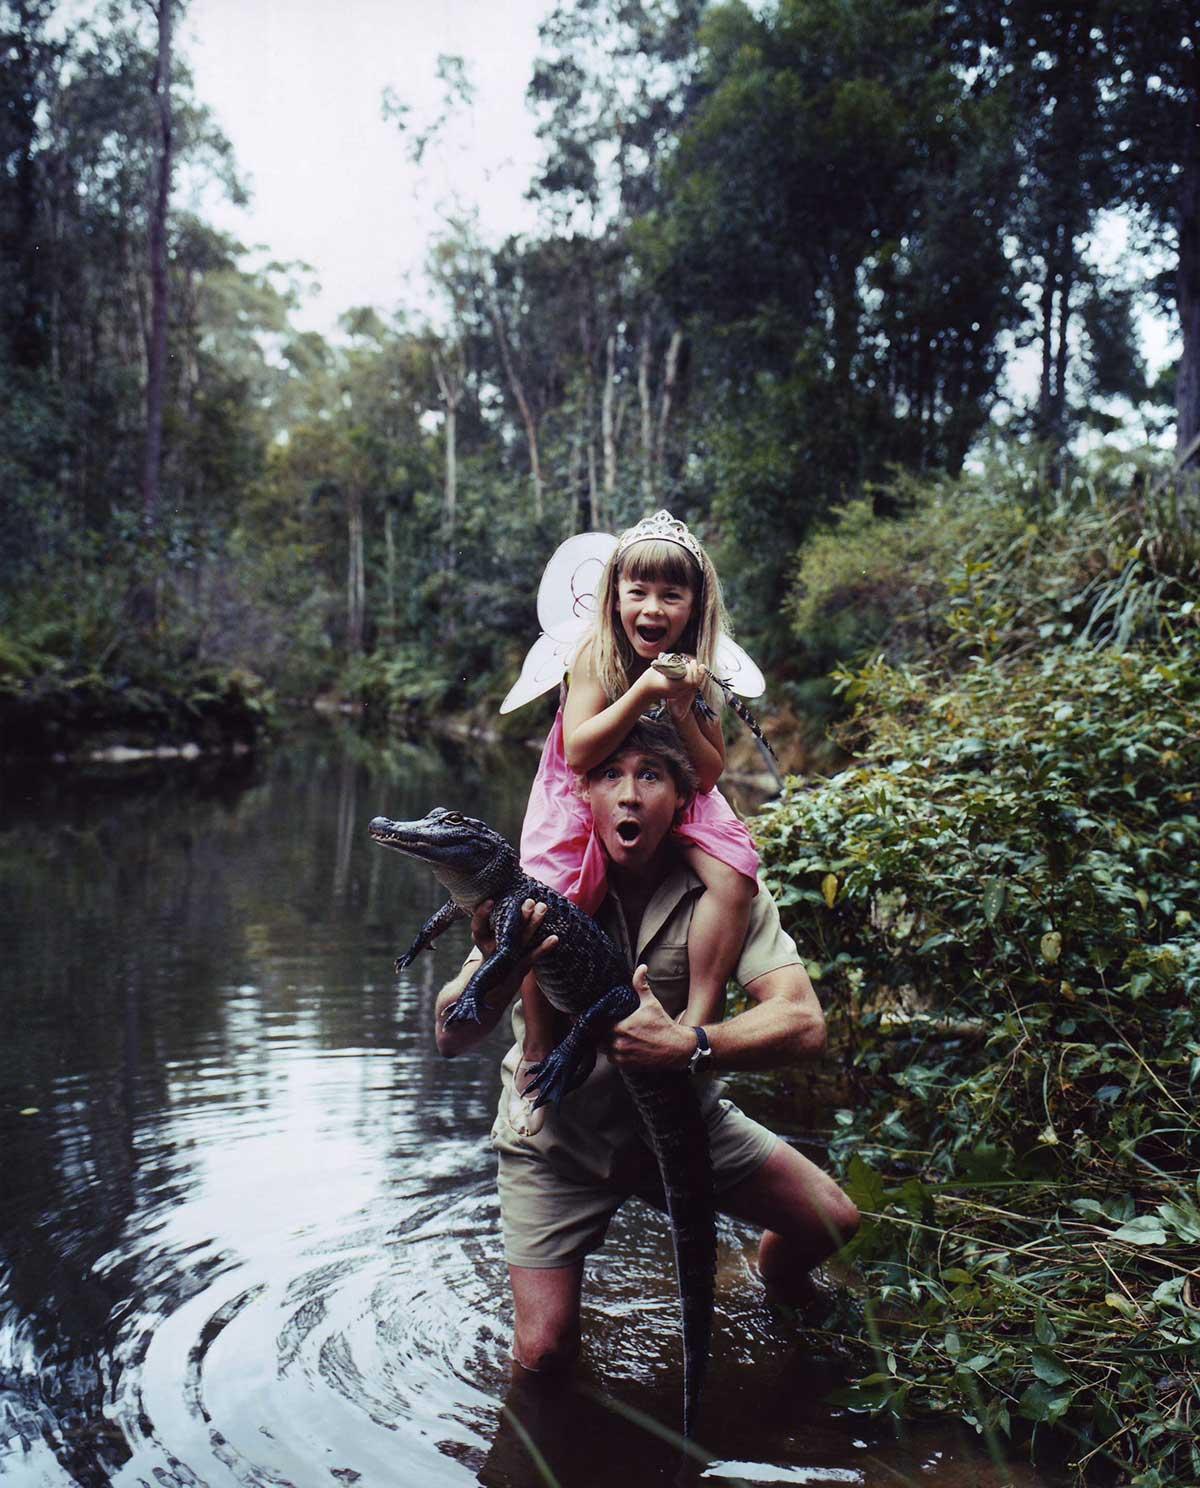 Steve-Irwin-with-his-daughter-Bindi-Irwin.jpg